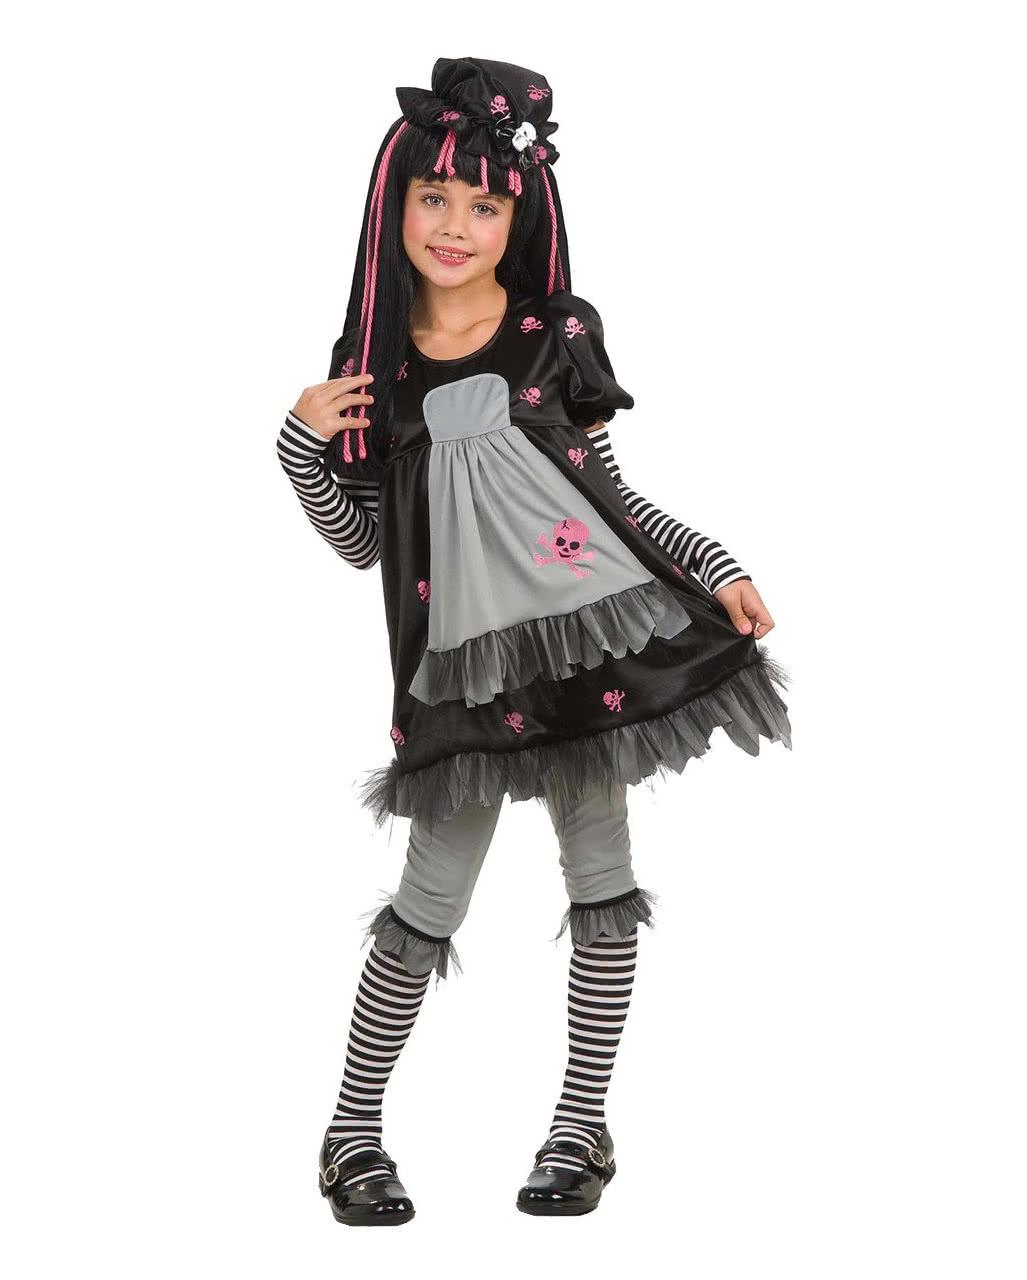 gothic doll kinderkost m kinderkost me kaufen horror. Black Bedroom Furniture Sets. Home Design Ideas